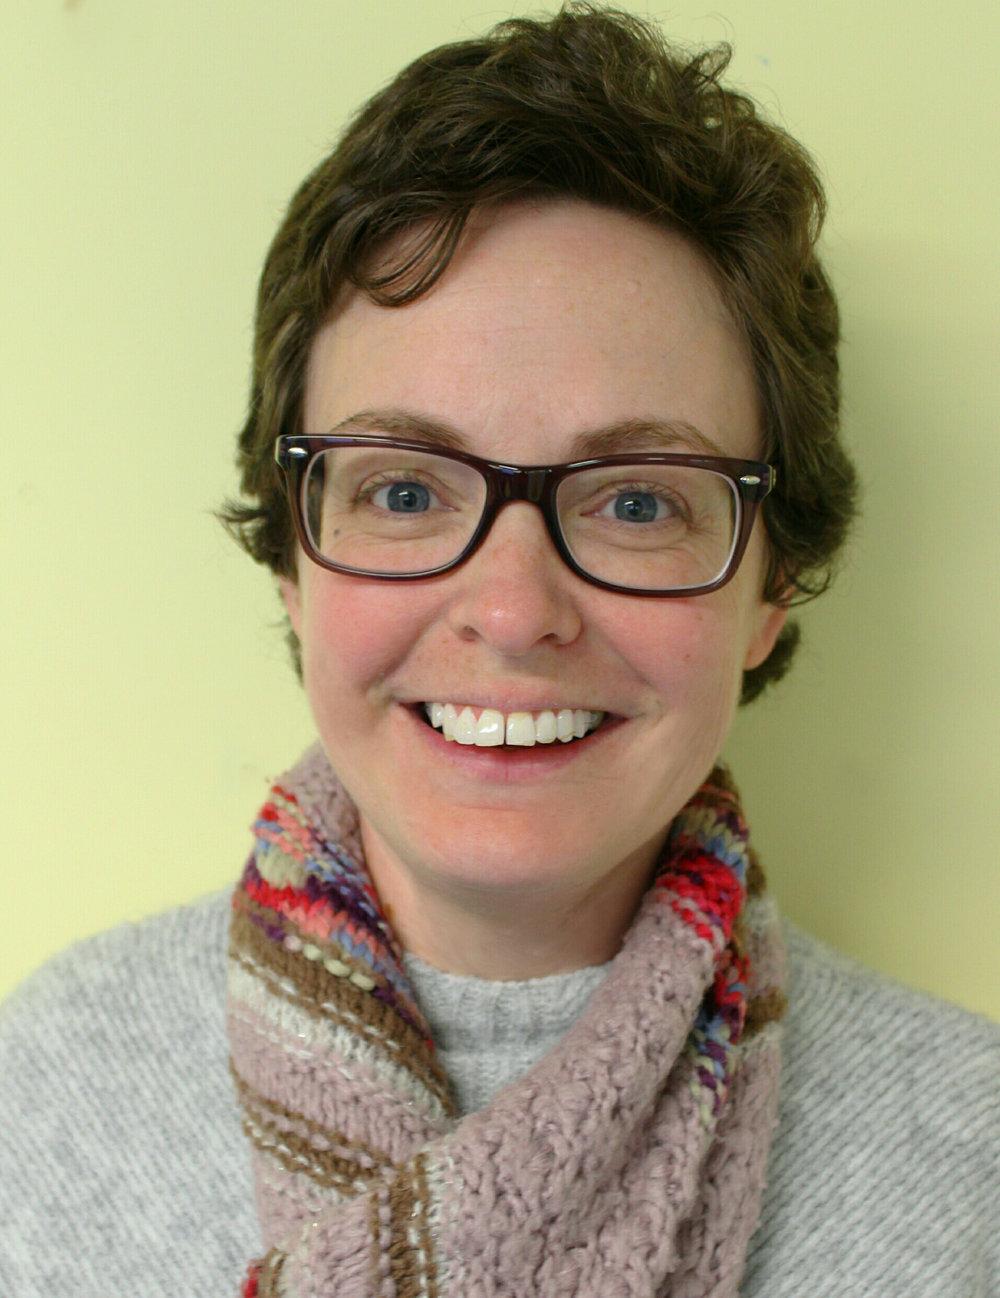 Kate Coughlan SNA, Beech